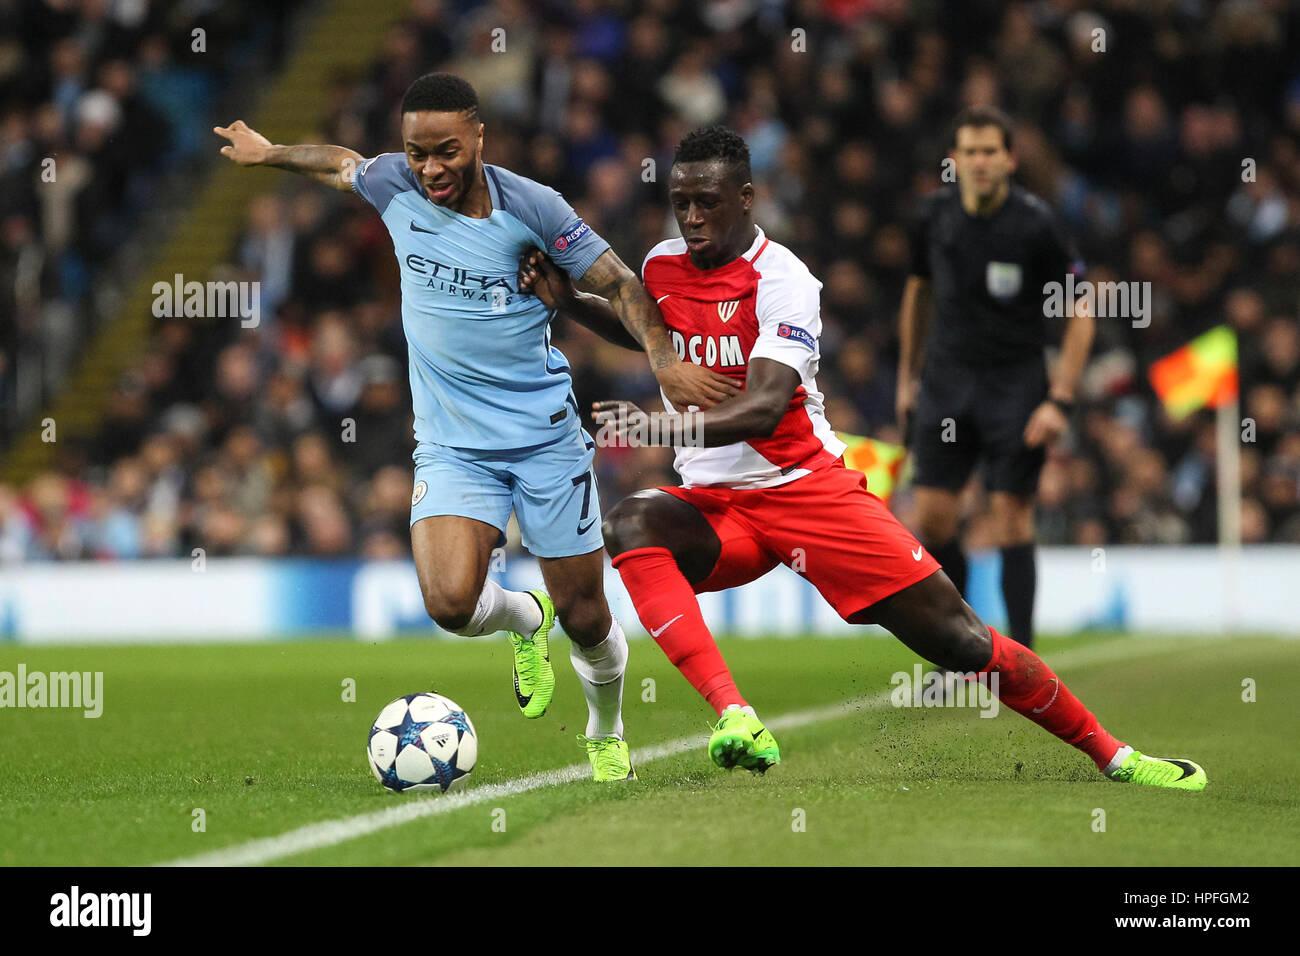 Manchester UK 21st Feb 2017 Raheem Sterling of Manchester City